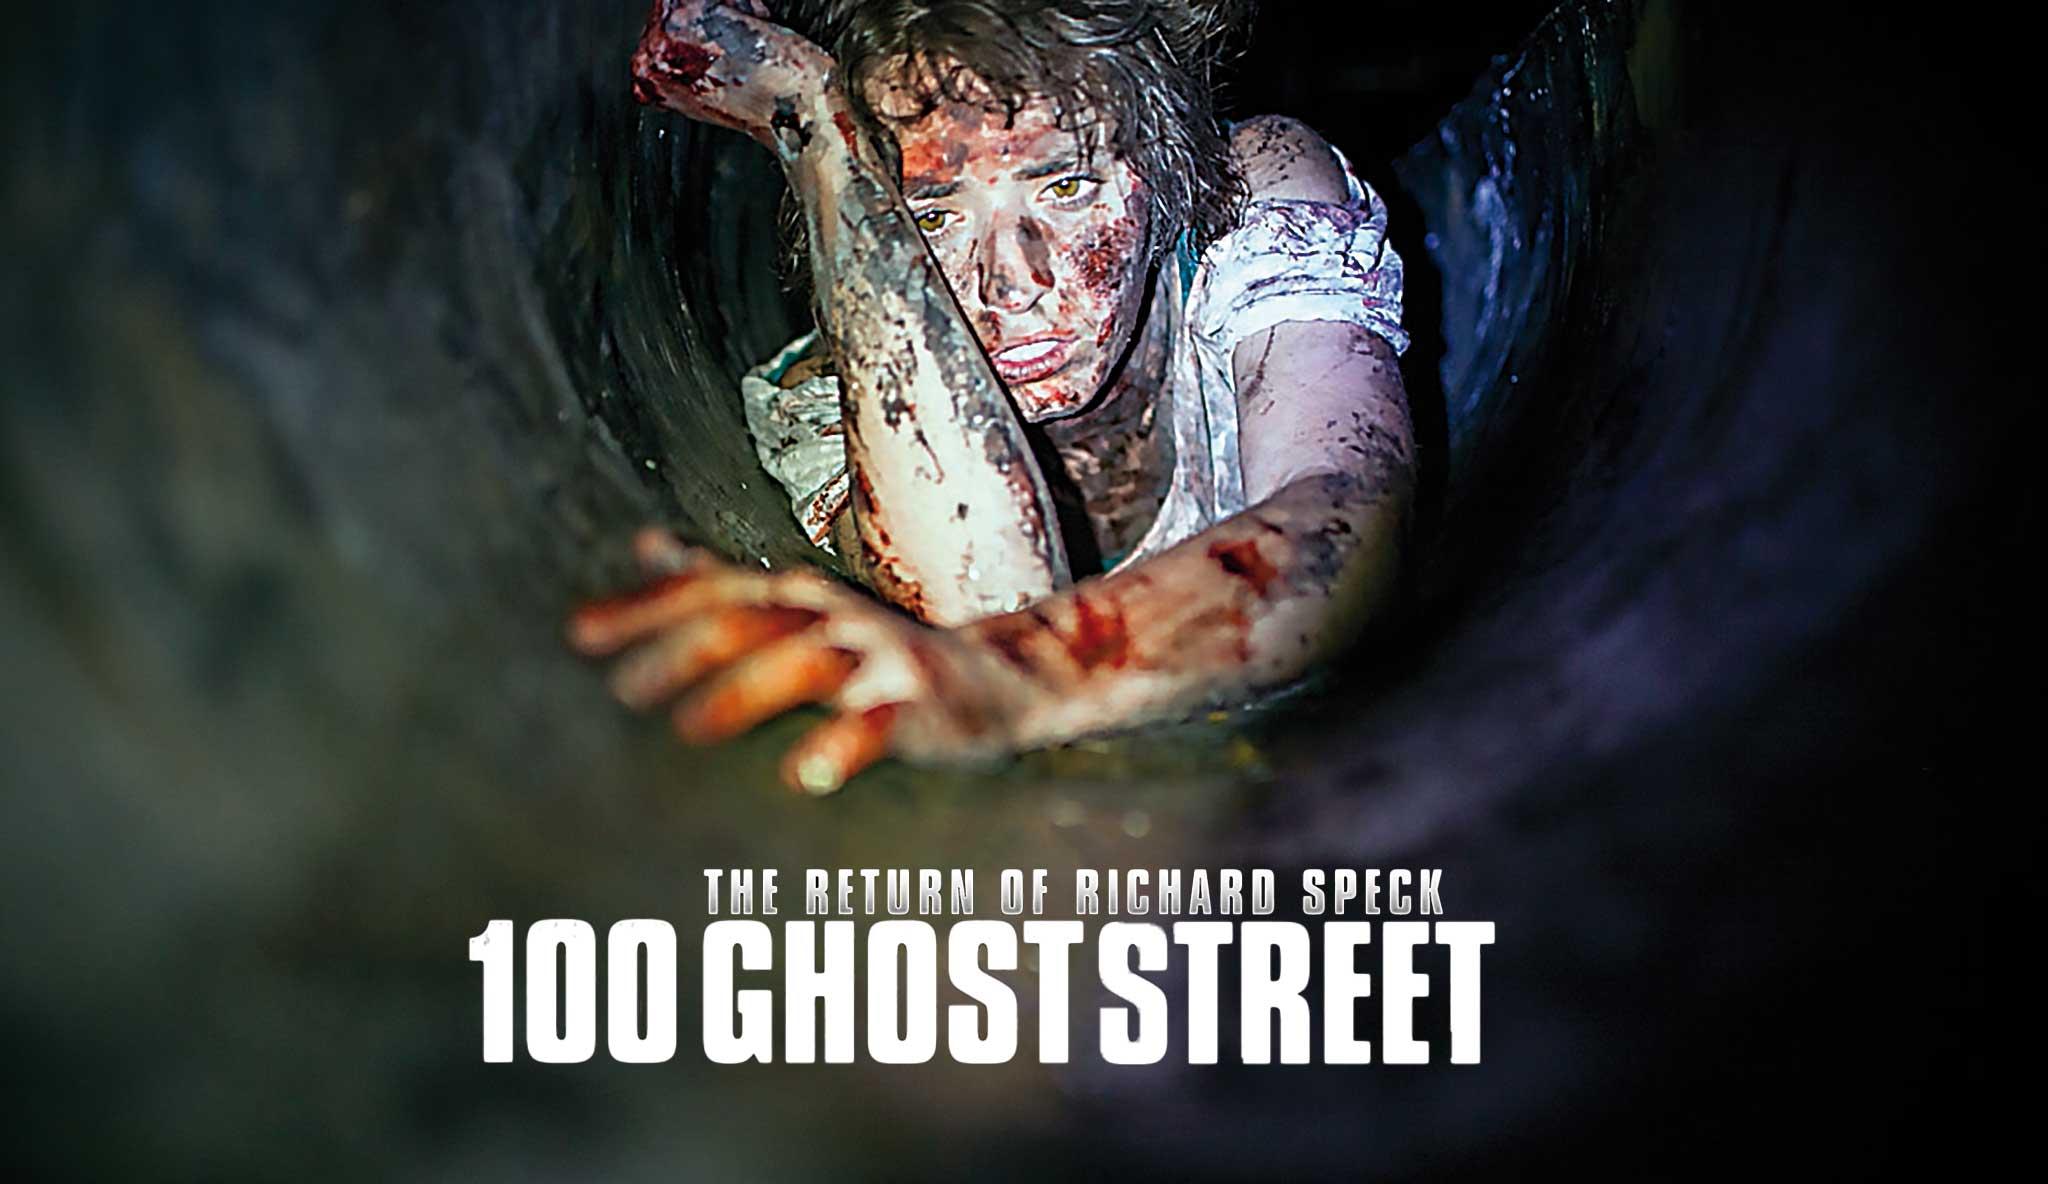 100-ghost-street-the-return-of-richard-speck\header.jpg